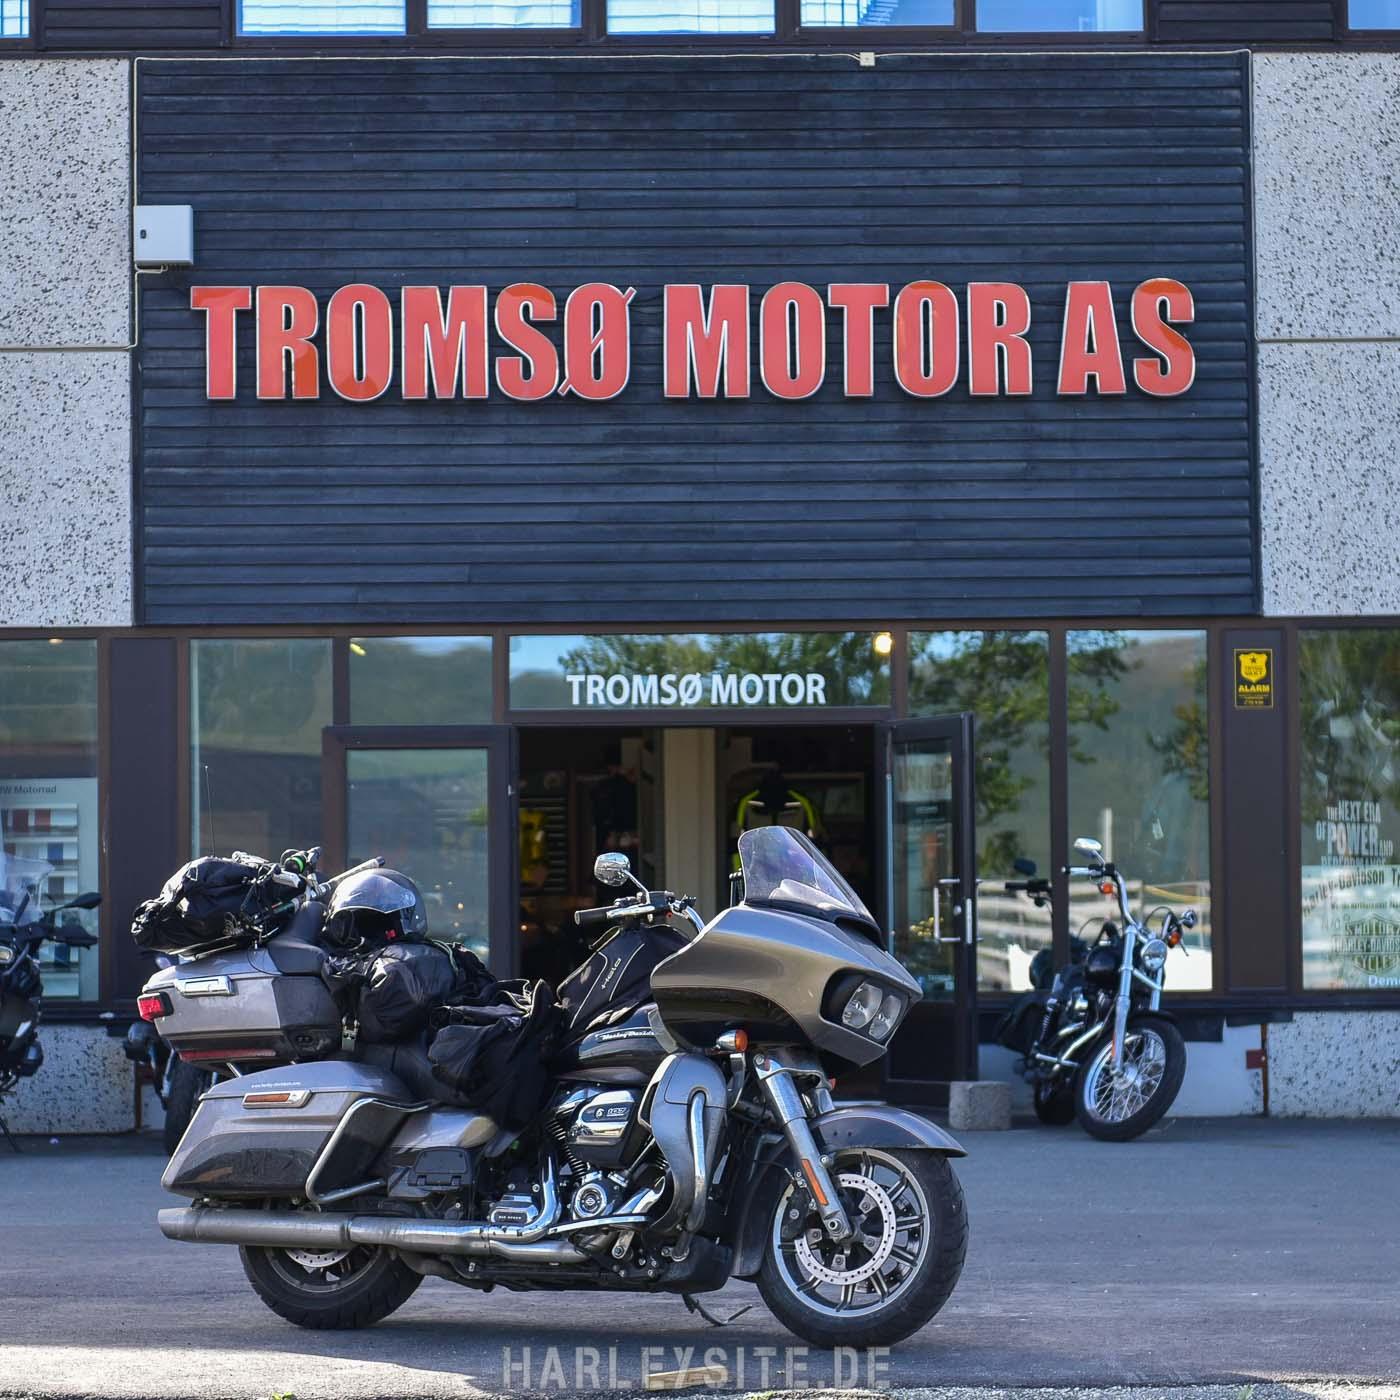 386 Harley Nordkap Tour DSC 8120